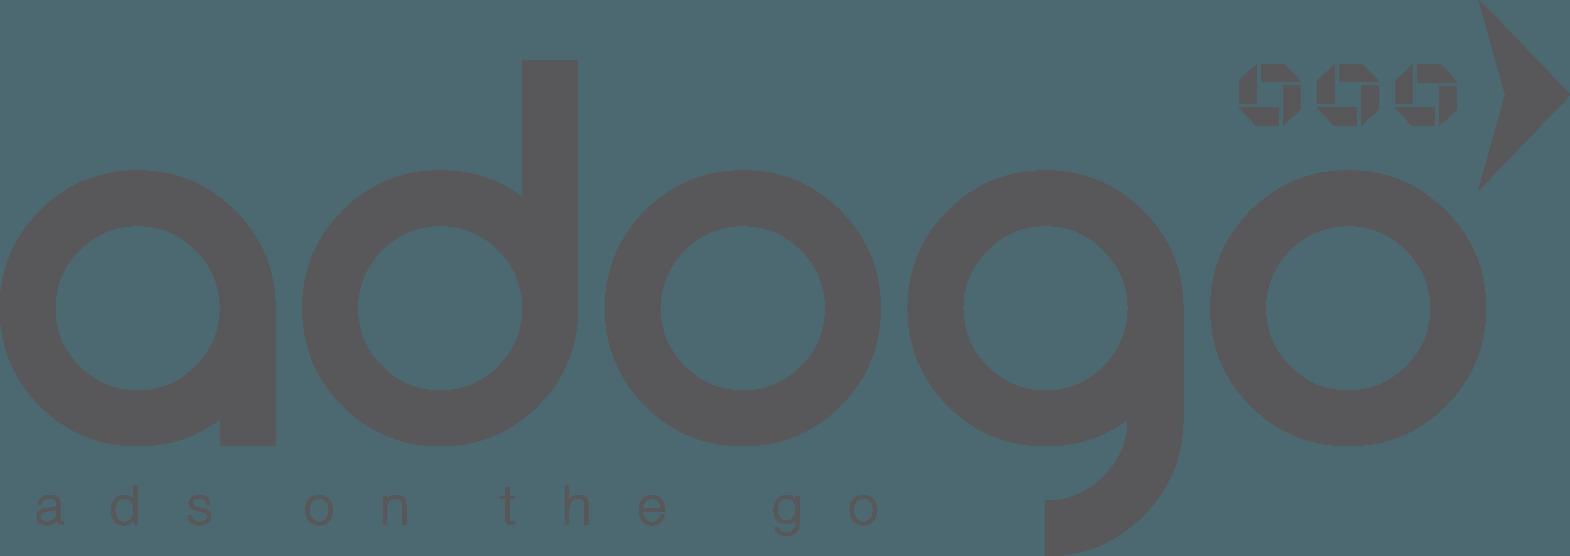 Adogo Private Limited